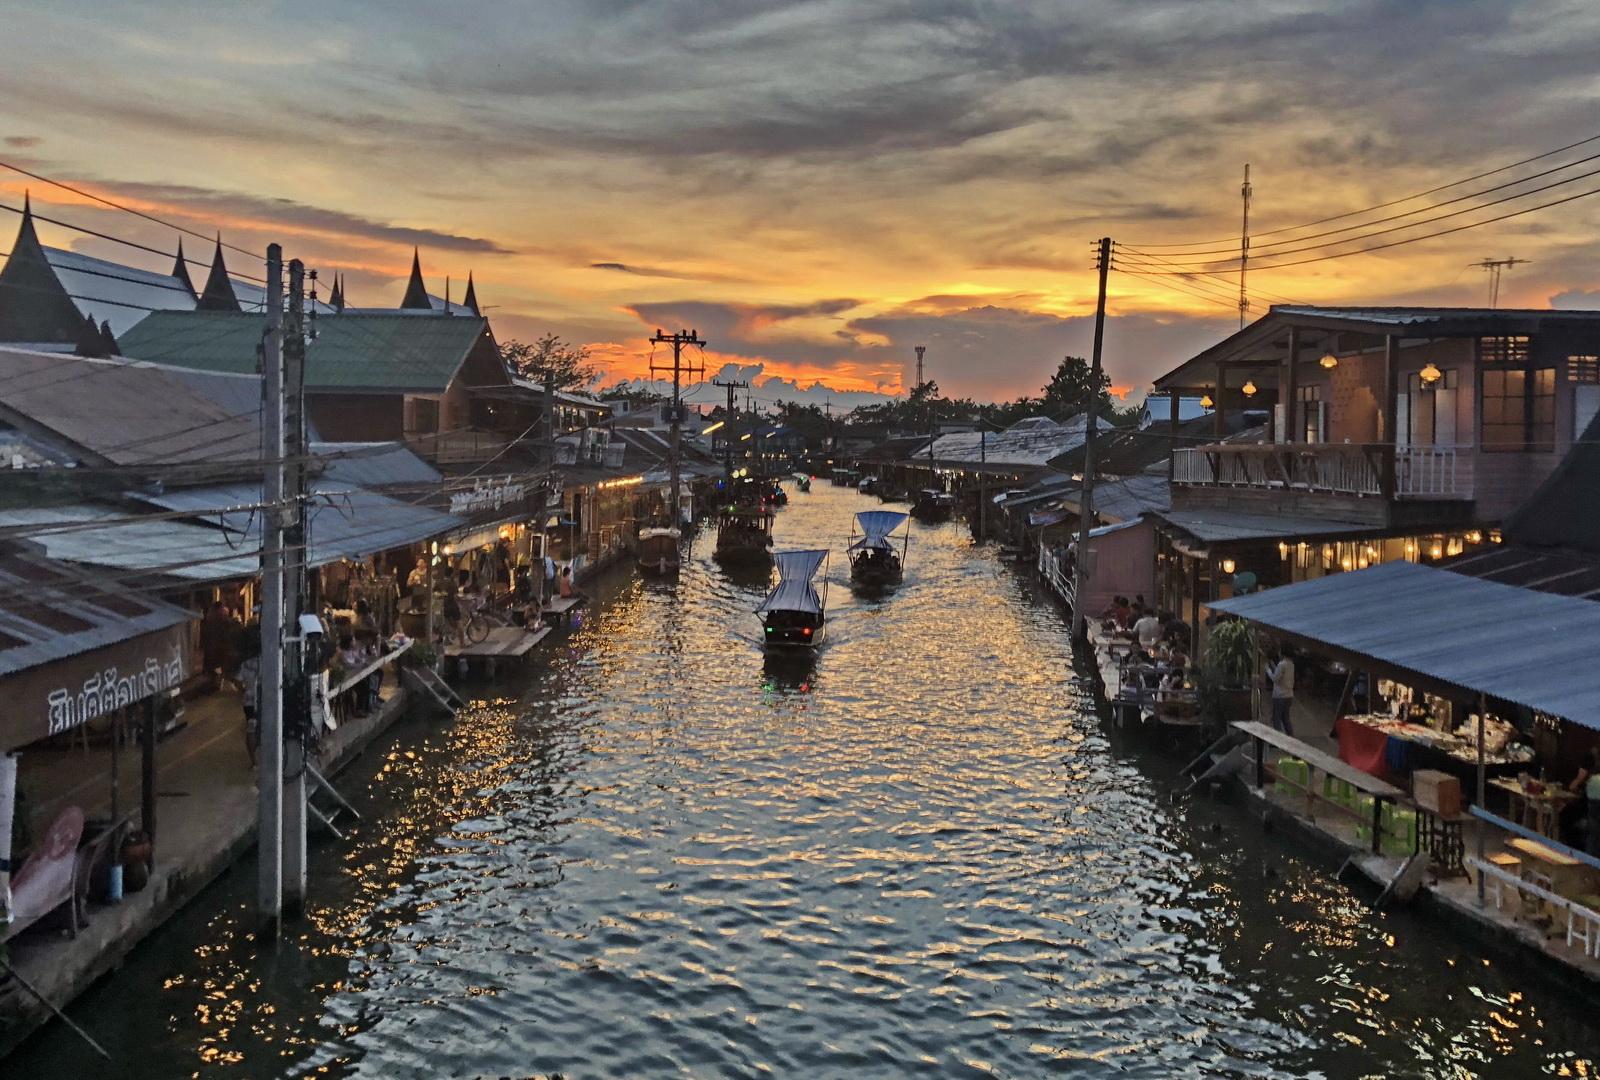 Thailand, Amphawa sunset